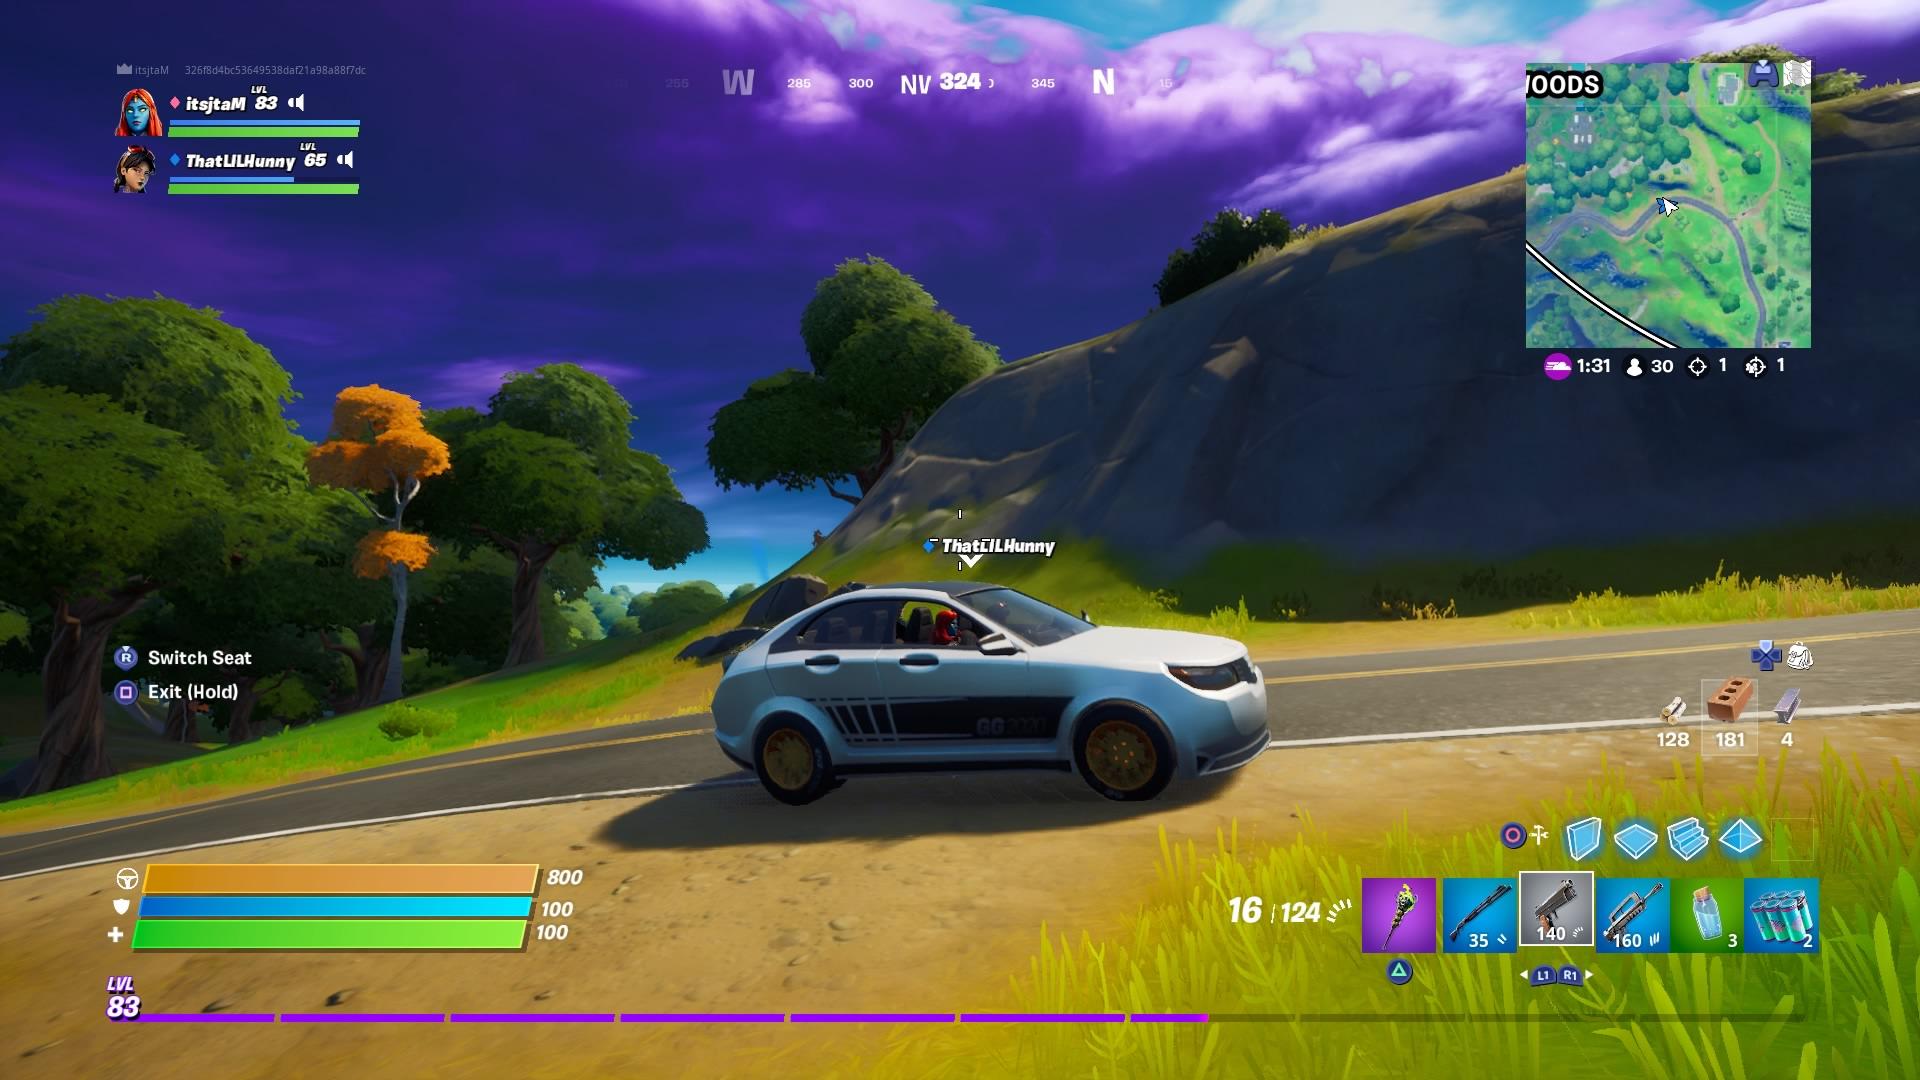 fortnite driving wallpaper 72074